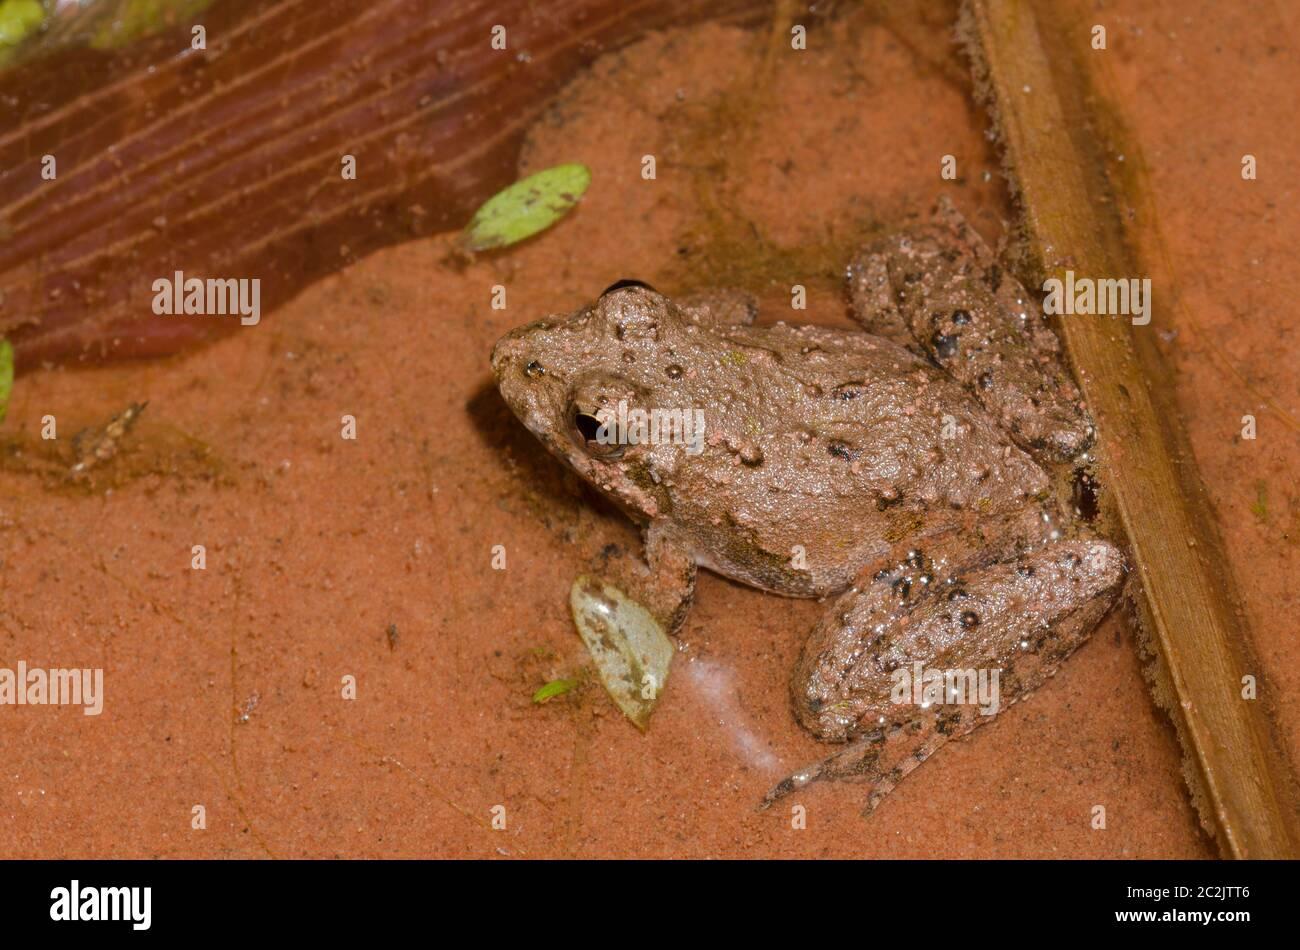 Blanchard's cricket frog, Acris blanchardi Stock Photo